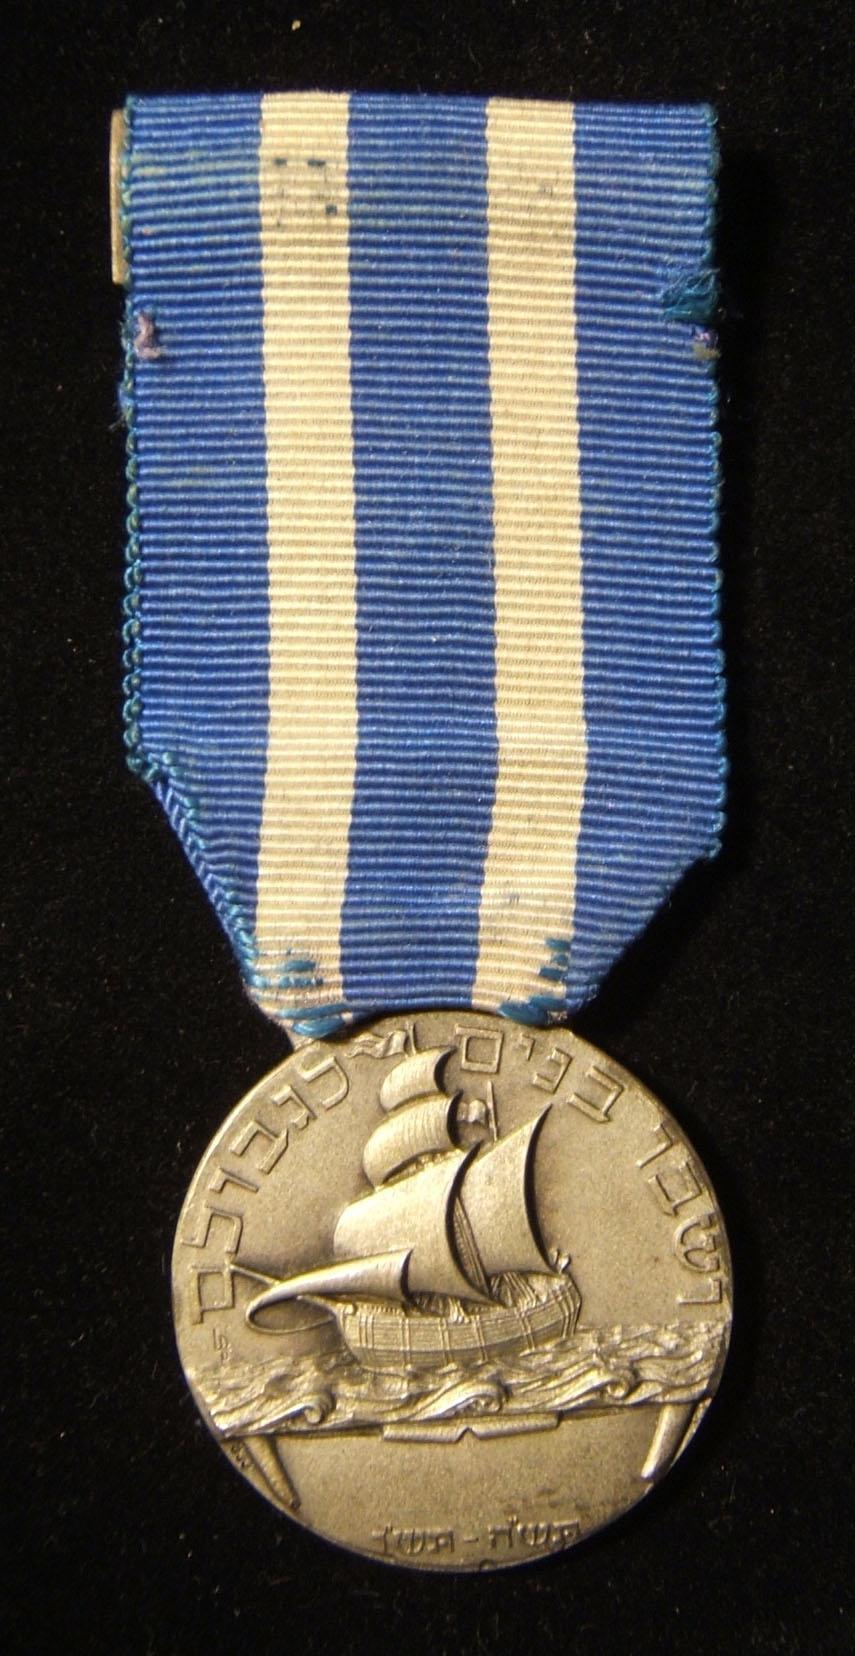 Silver Judea Restituta clandestine Jewish immigration award by Arazi/Minerbi